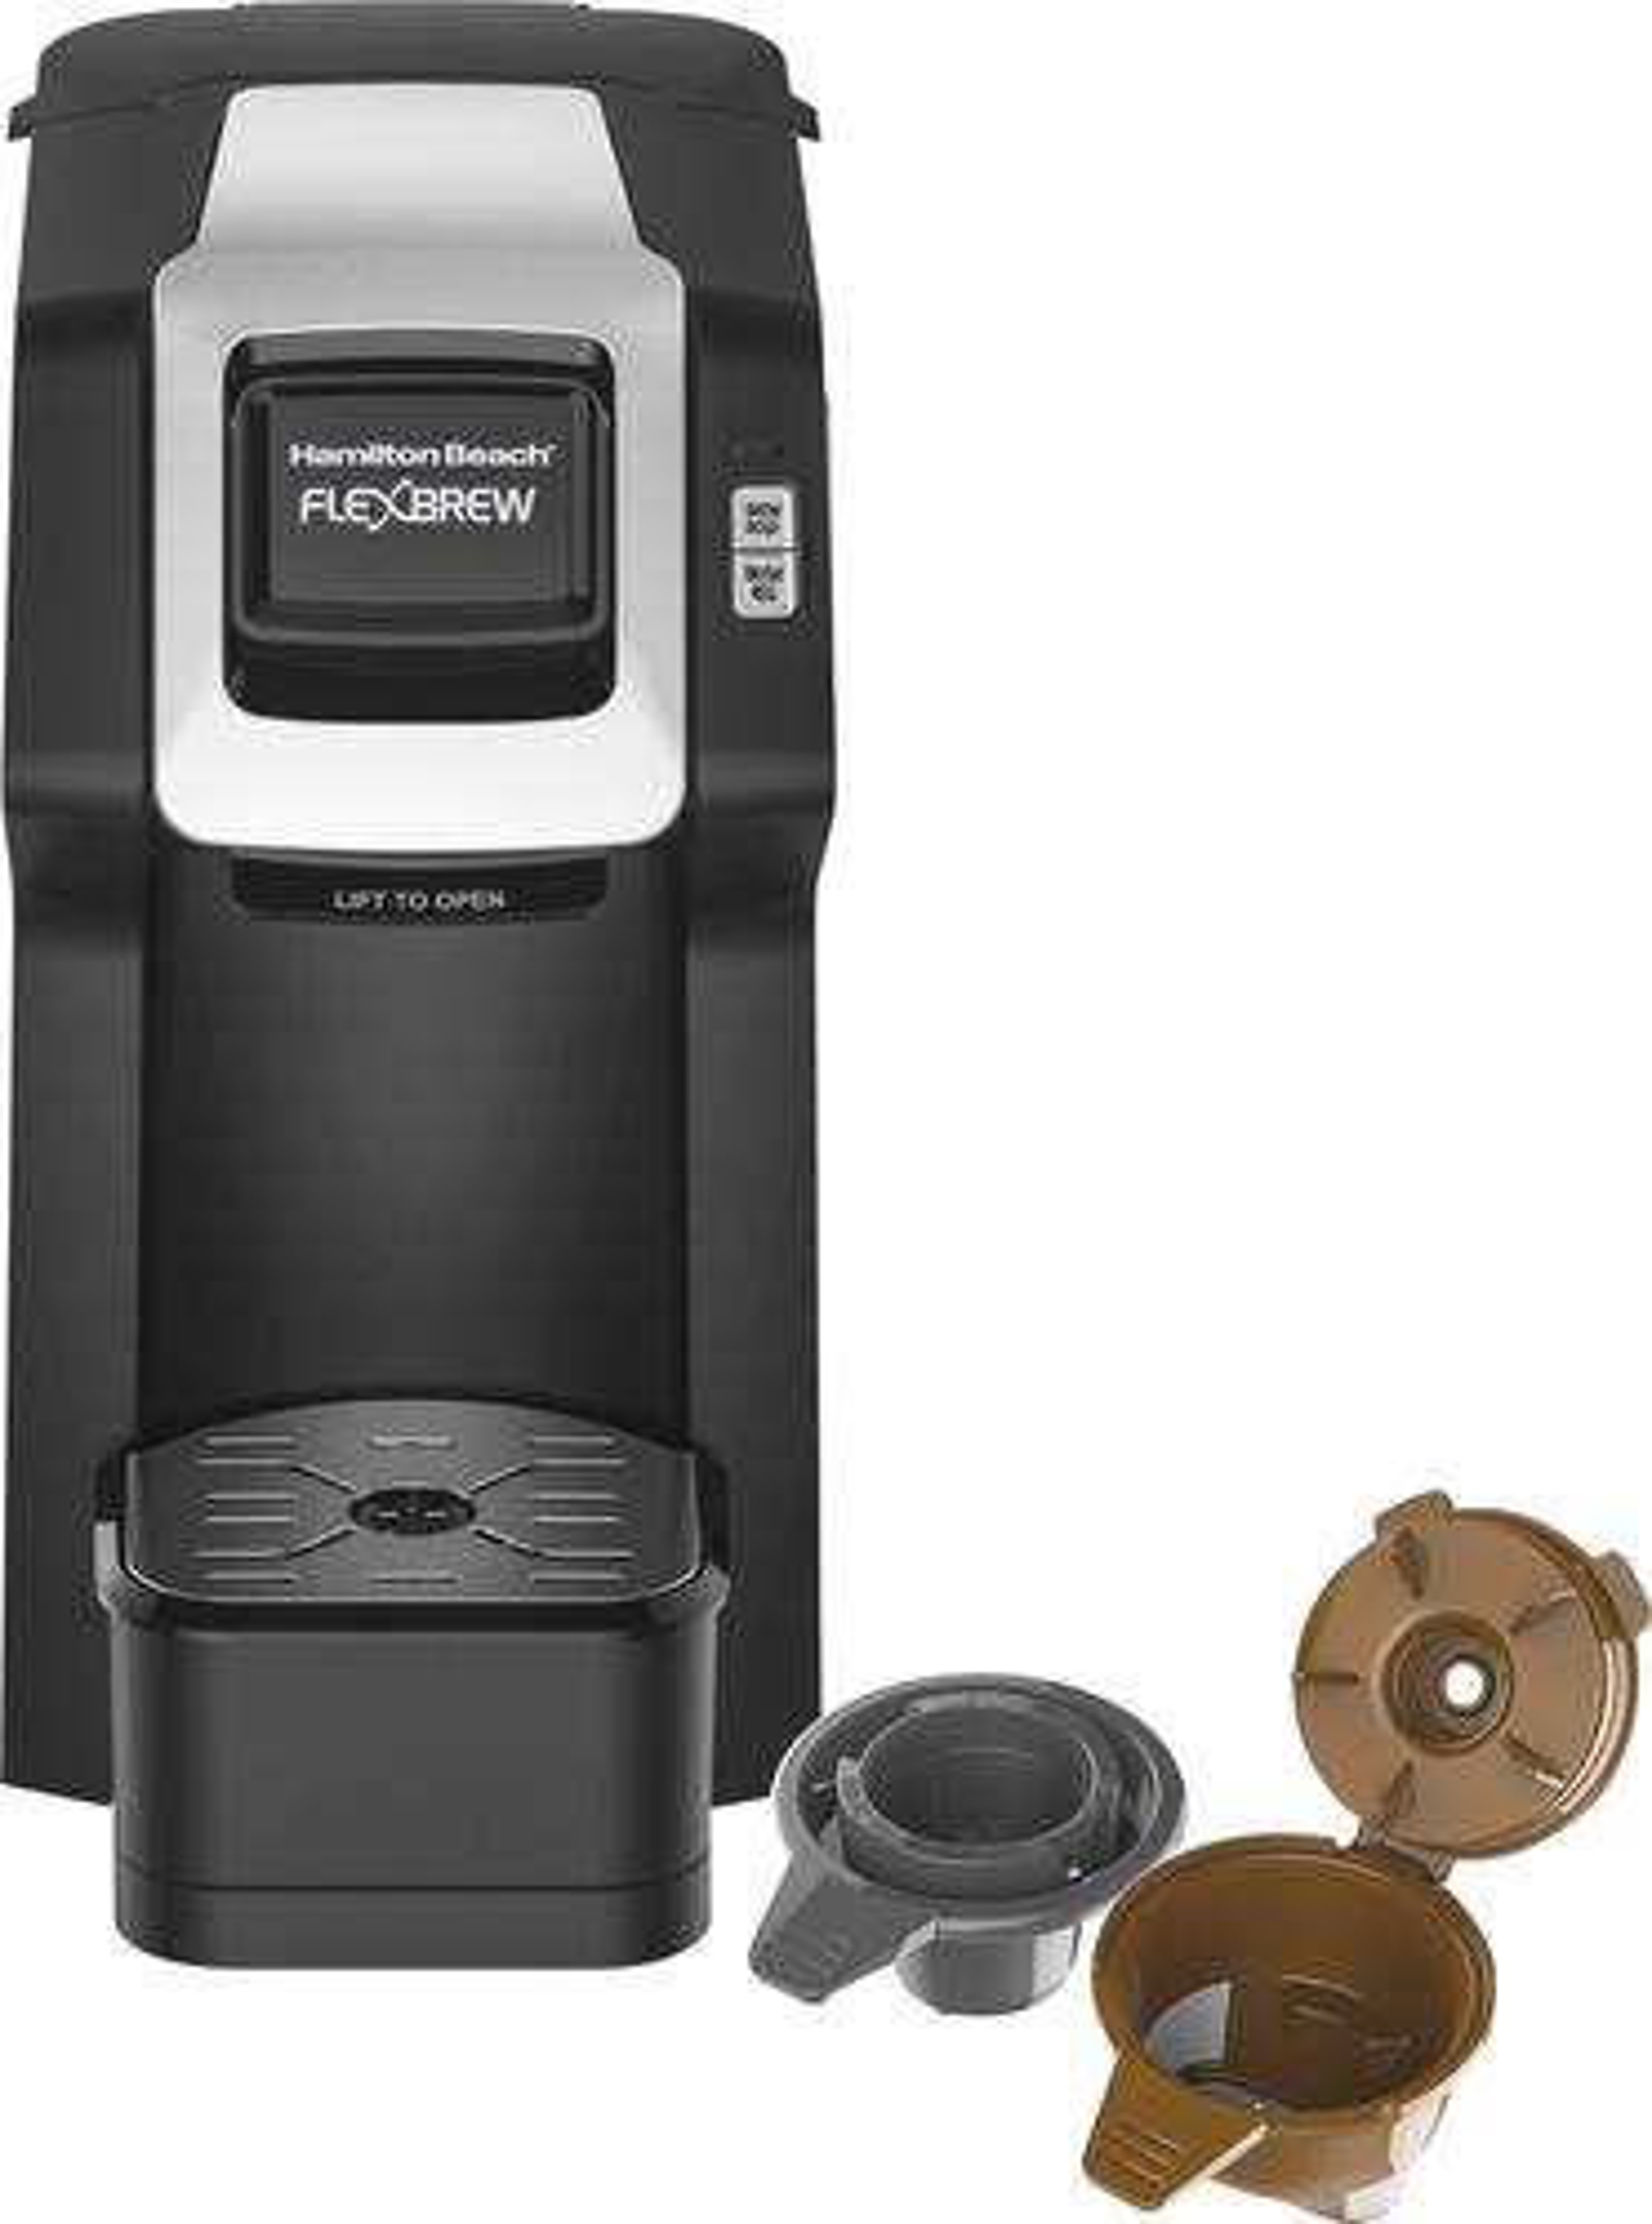 Hamilton Beach - FlexBrew Coffeemaker - Black 5890802